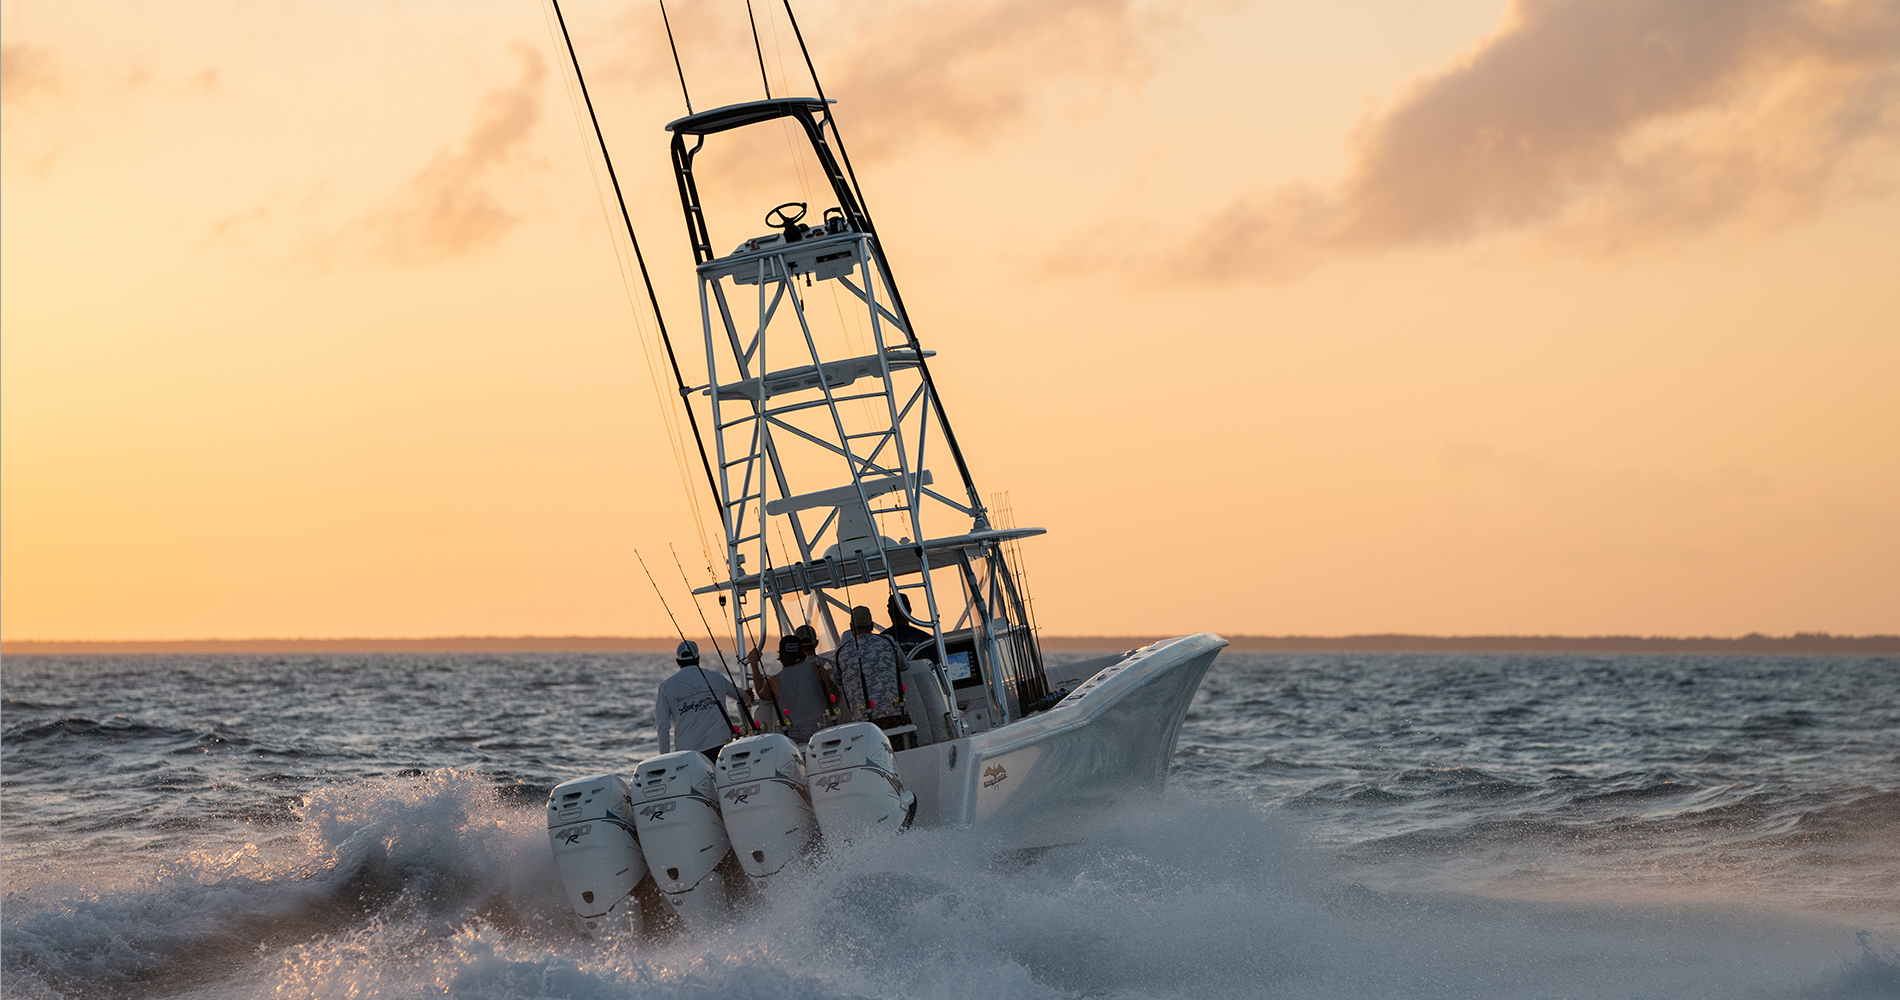 International invincible boat